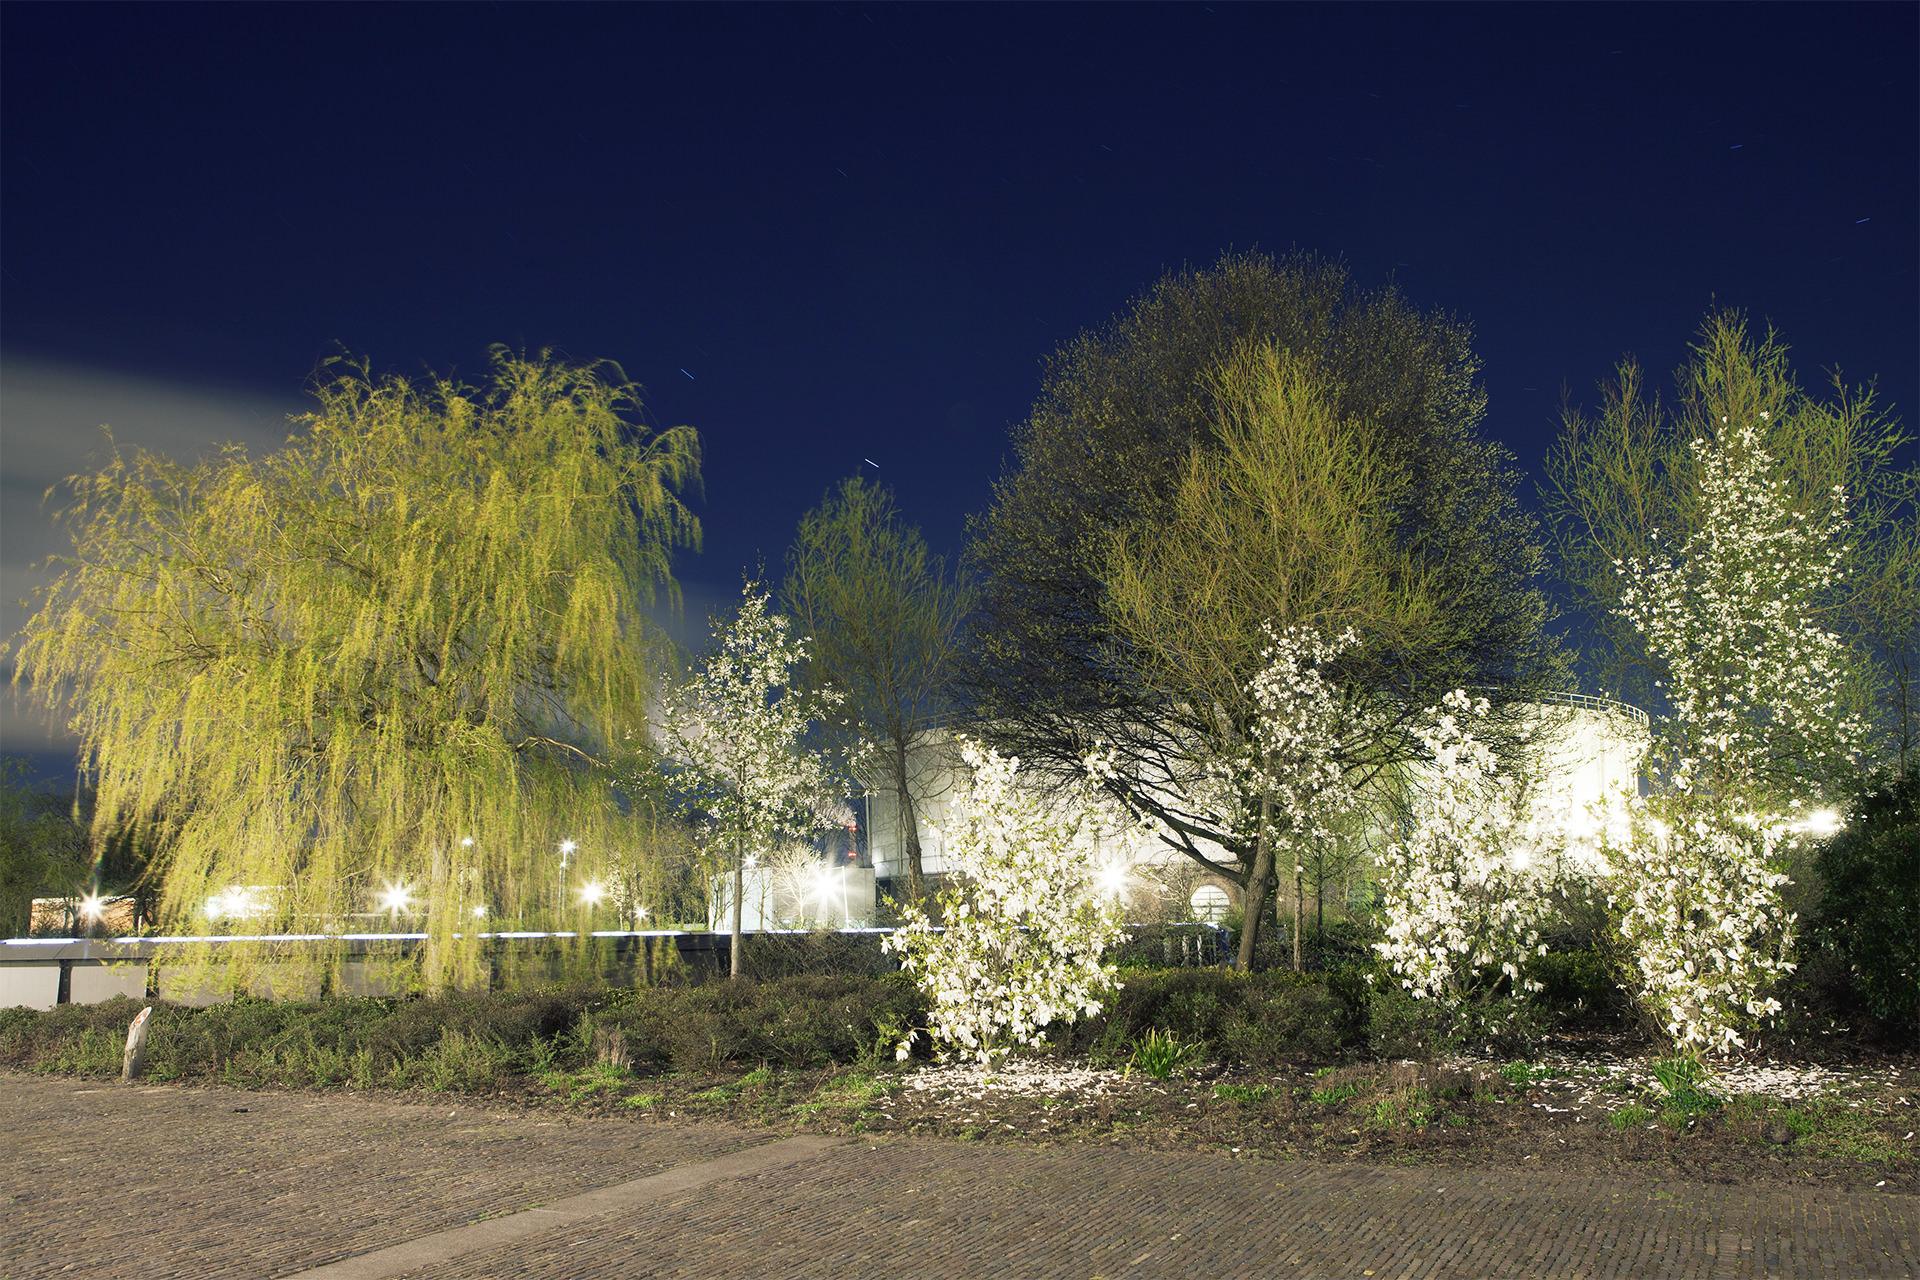 Nacht-bloesem-Amstedam-westerpark-bomen-fotografie-landschap.jpg